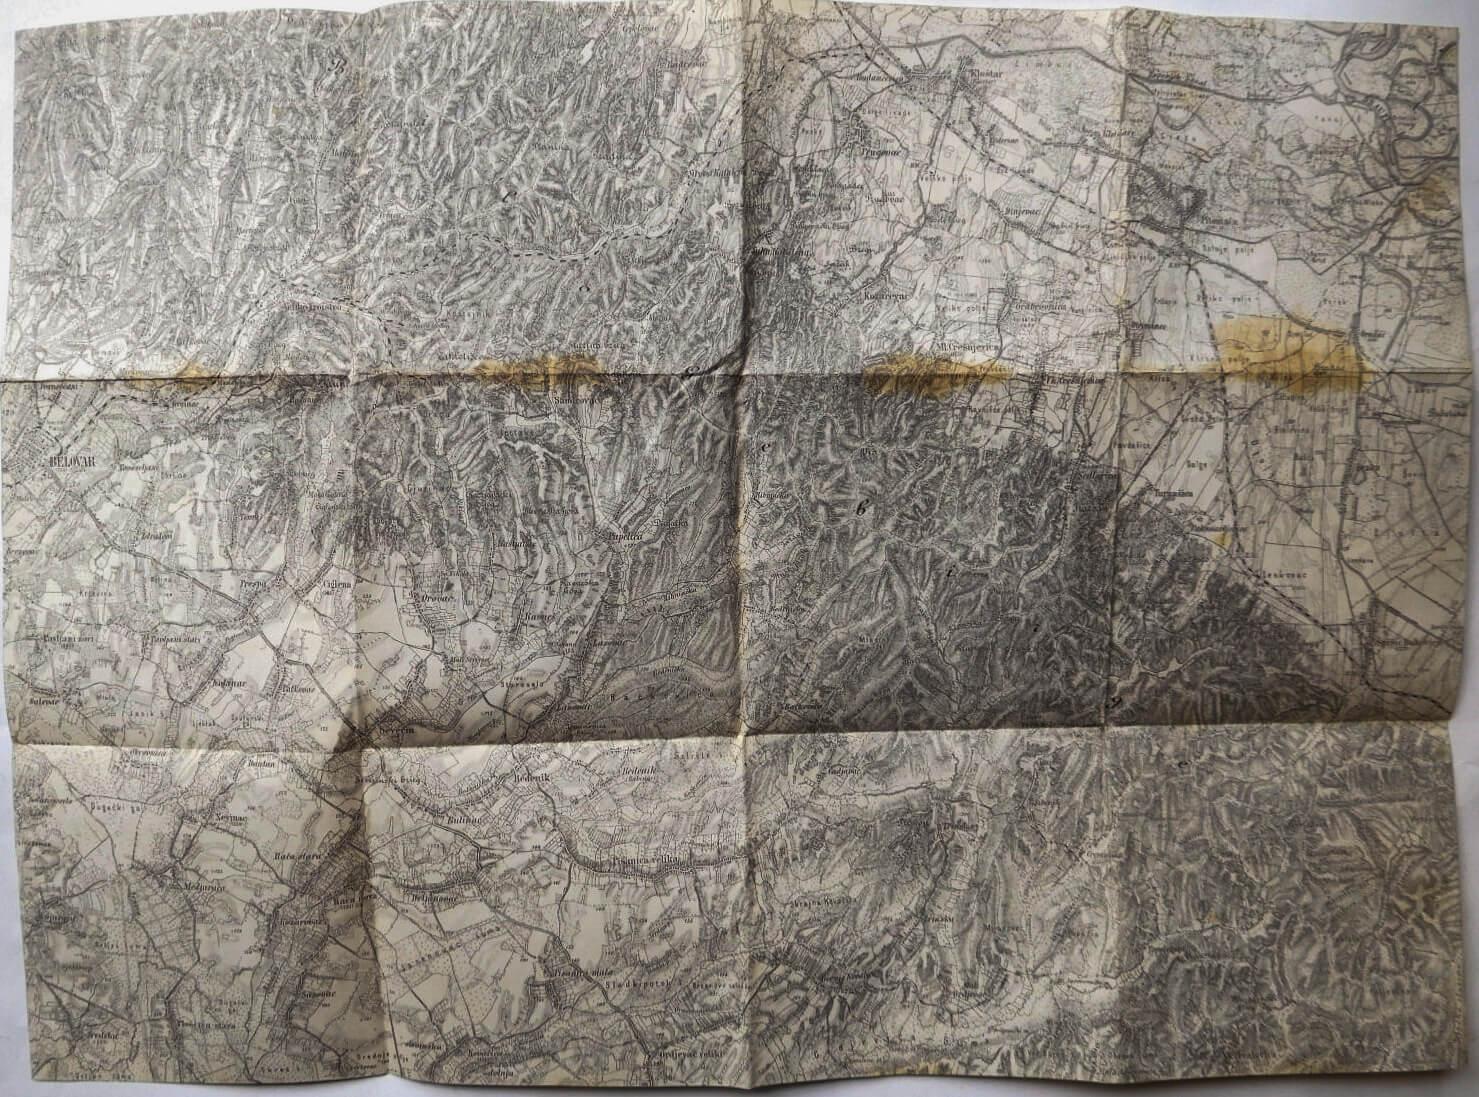 Croatia Kroatien Bjelovar and surroundings military map cca 1930